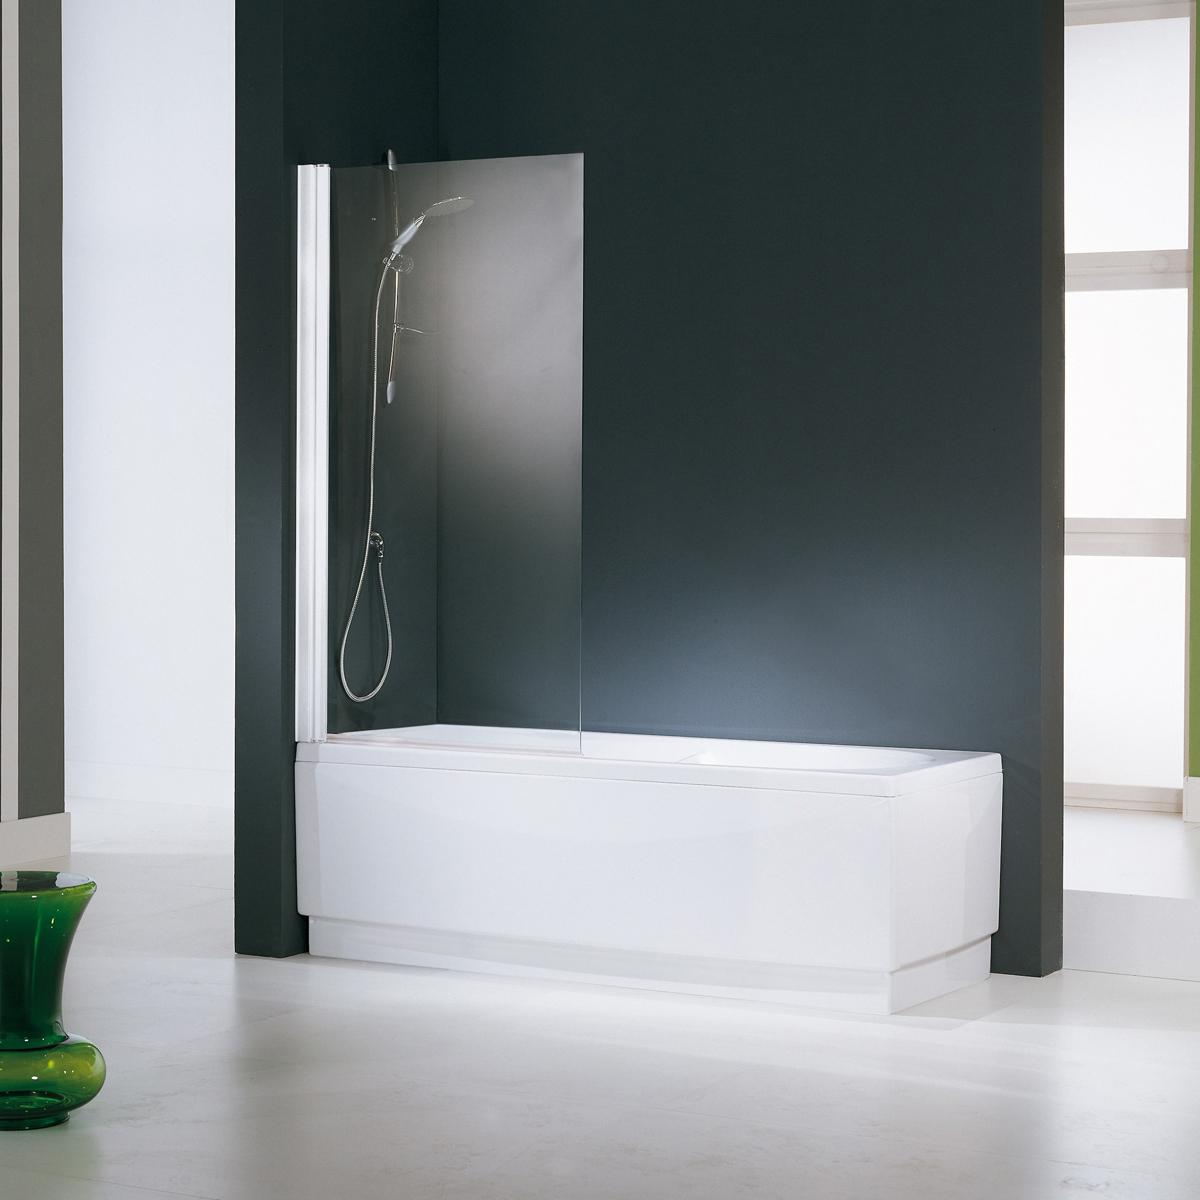 Novellini archivi arredobagno news - Leroy merlin parete vasca bagno ...